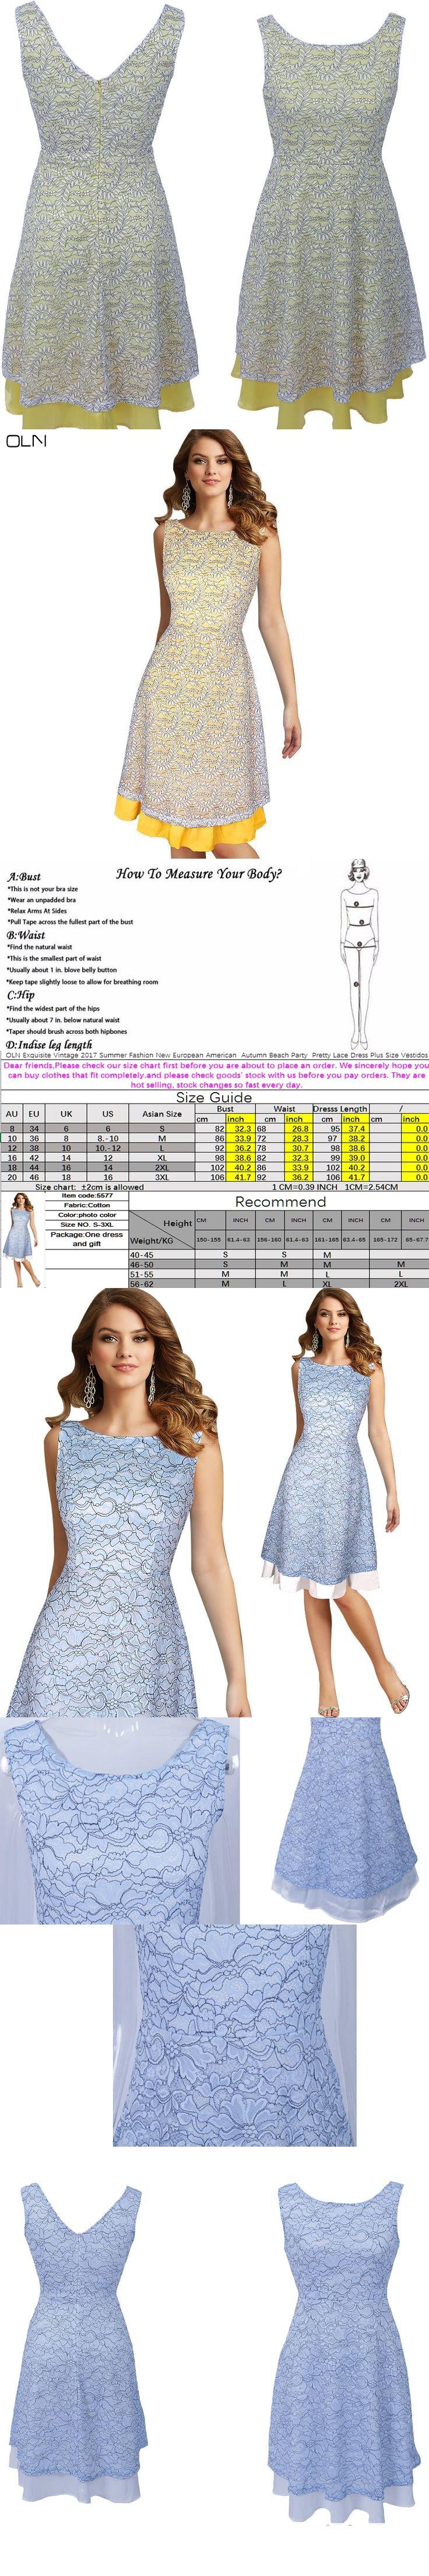 OLN Exquisite Vintage 2017 Summer Fashion New European American  Autumn Beach Party  Pretty Lace Dress Plus Size Vestidos